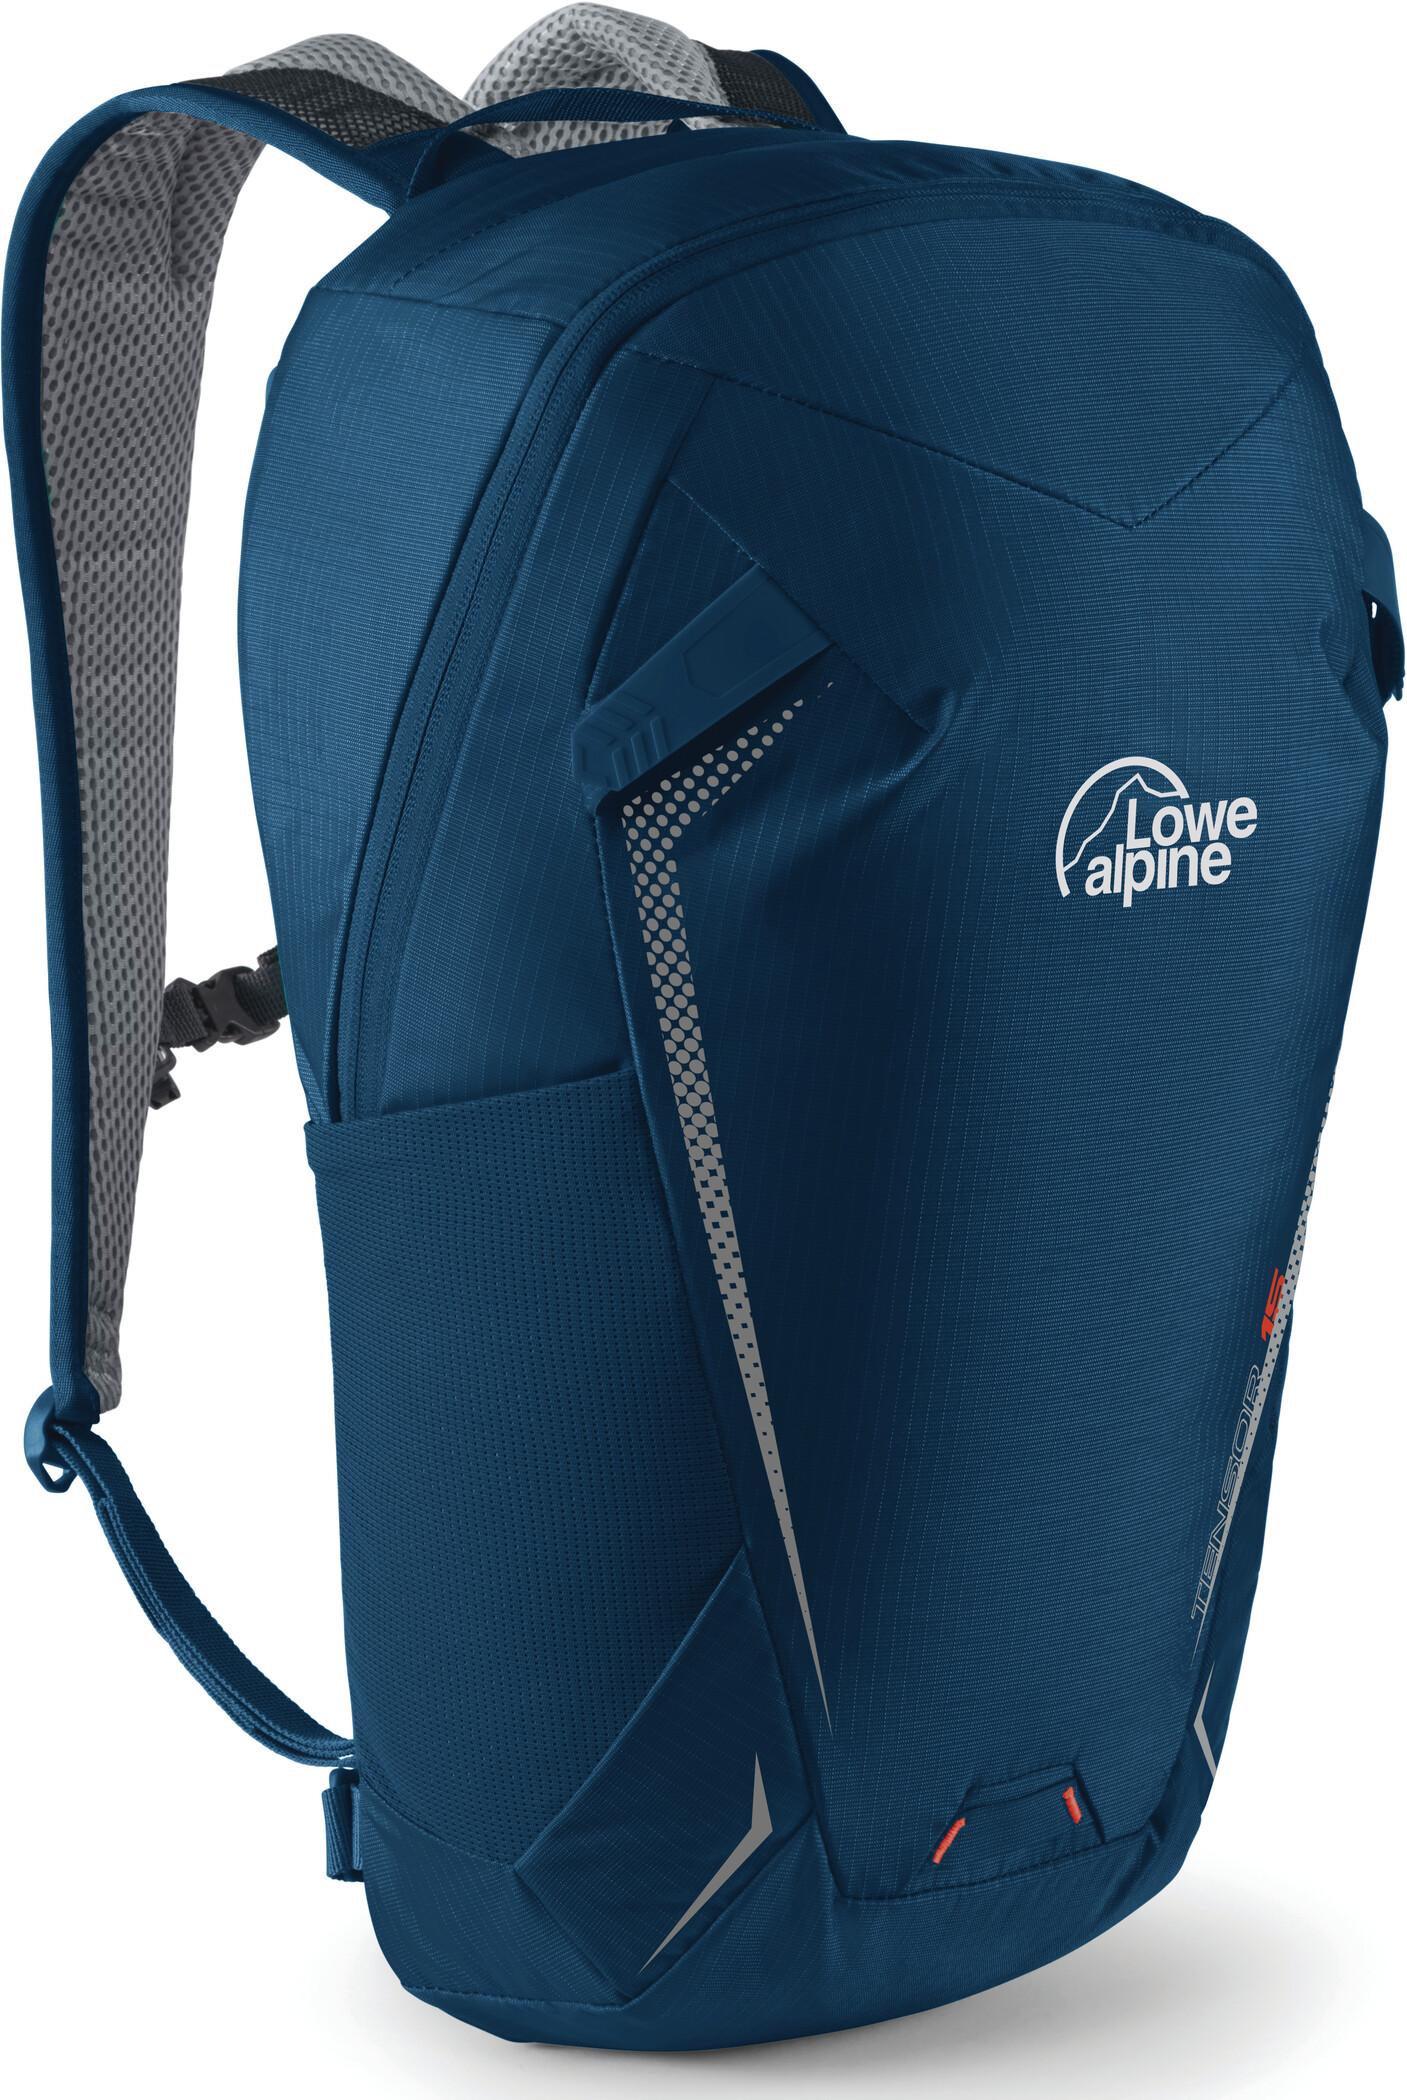 Lowe Alpine Tensor Backpack 16L, azure (2019)   Travel bags